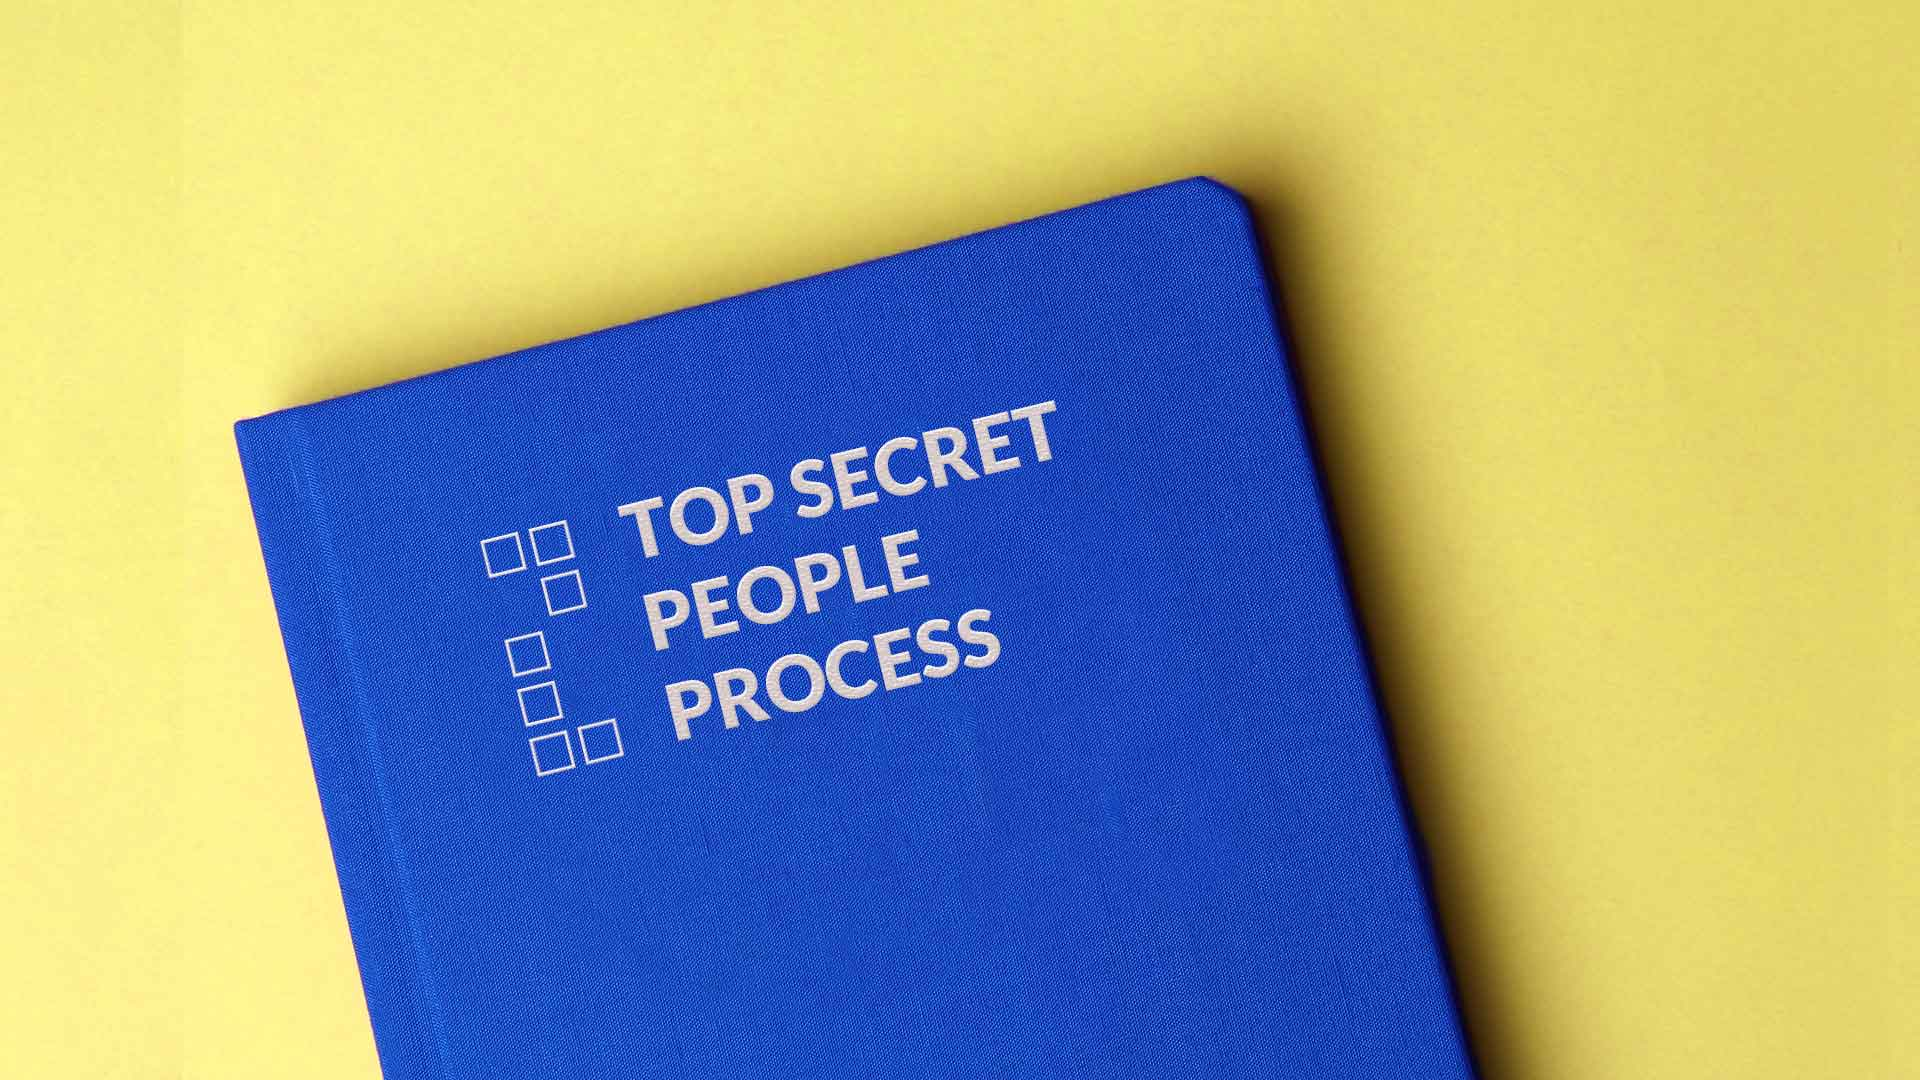 endsights-top-secret-people-process